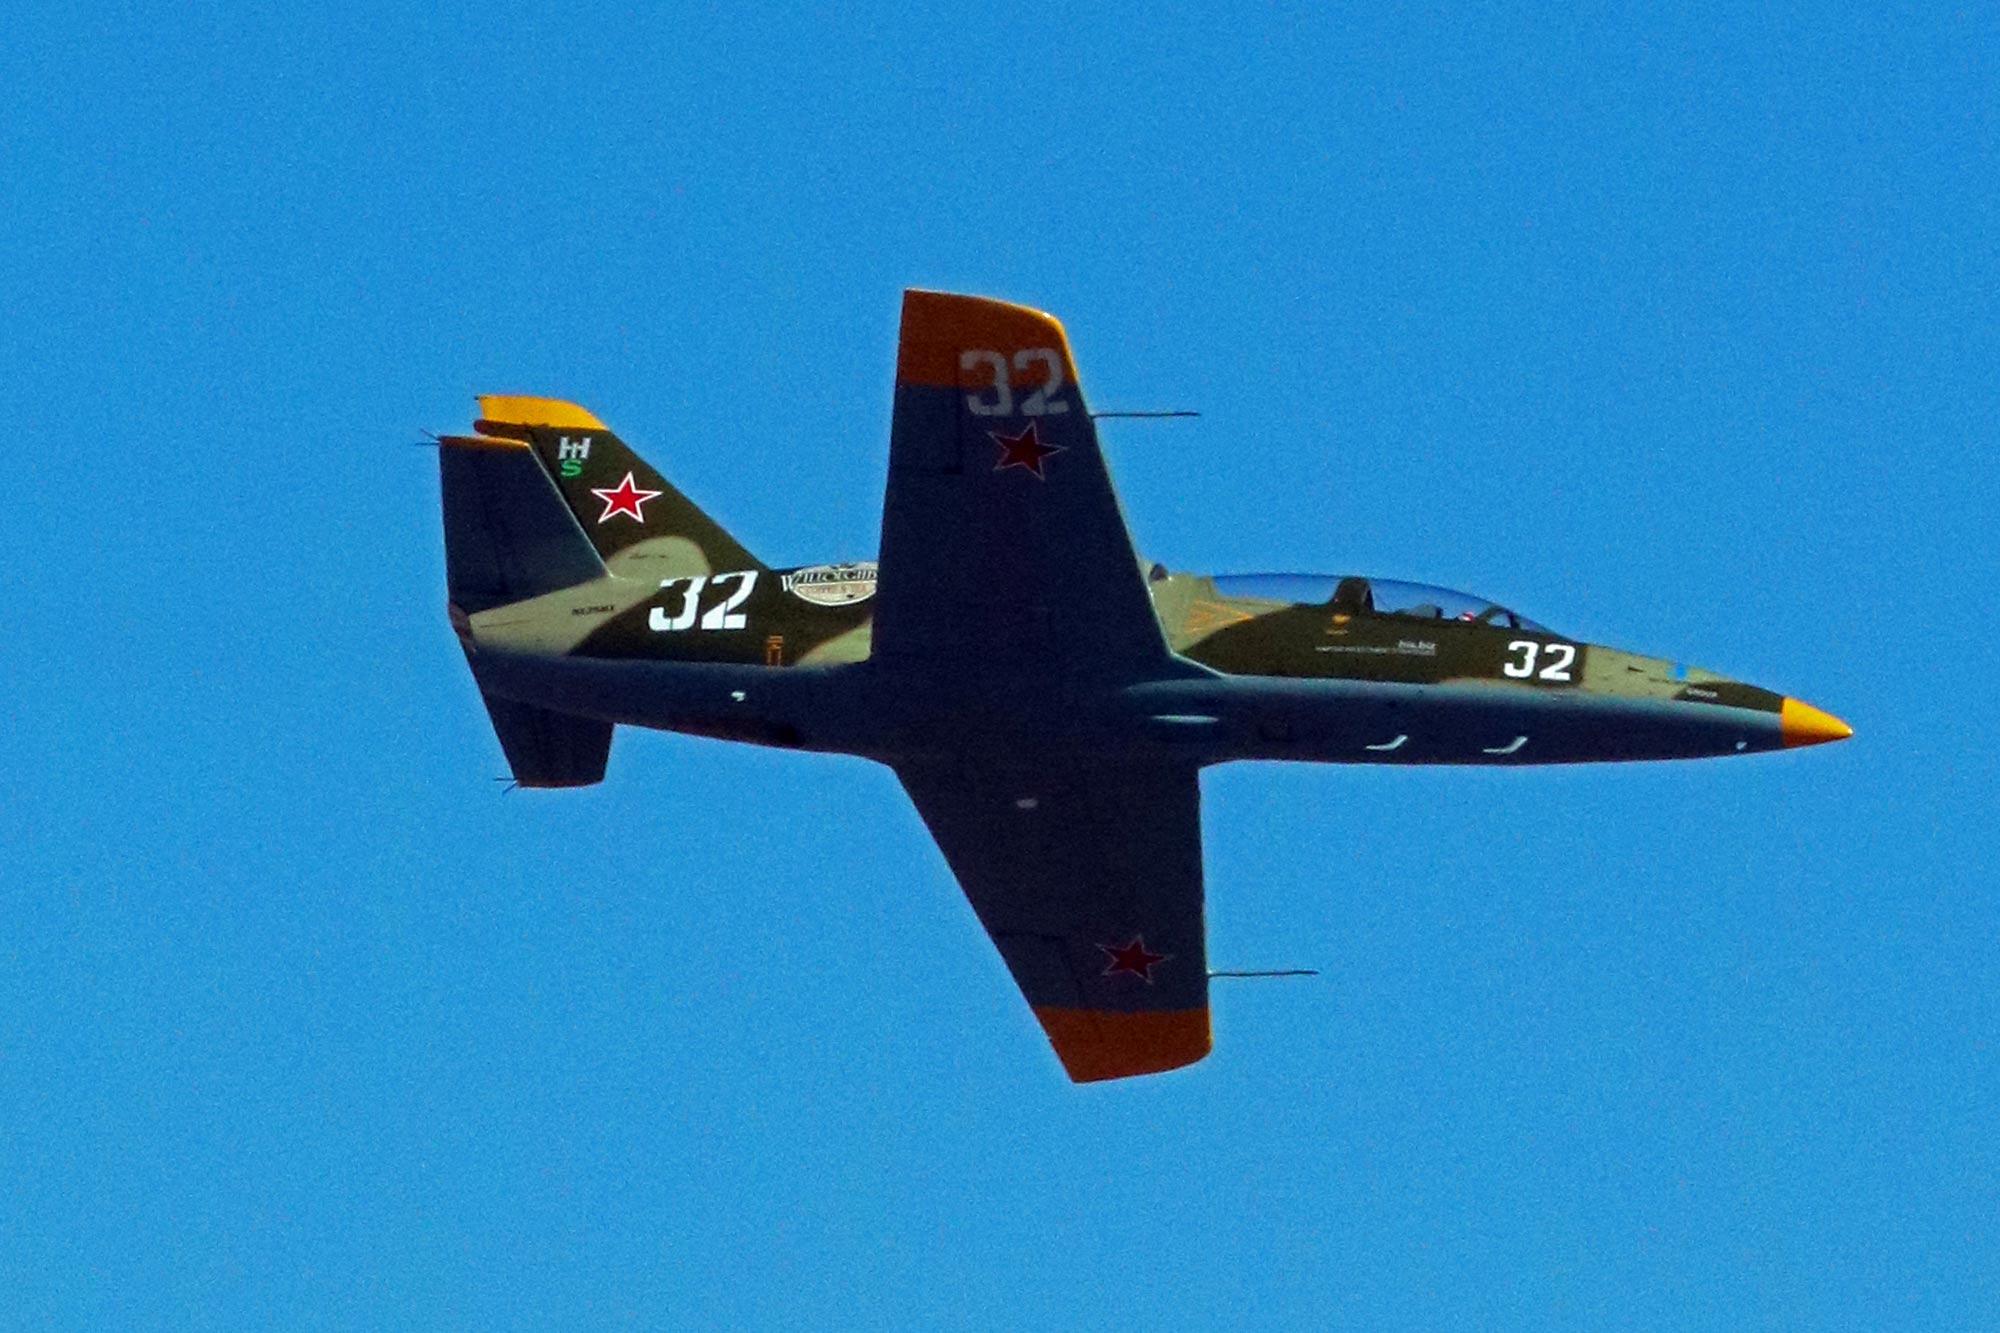 Jet-32-Heat3C-2ndPalce-160916Reno_0519